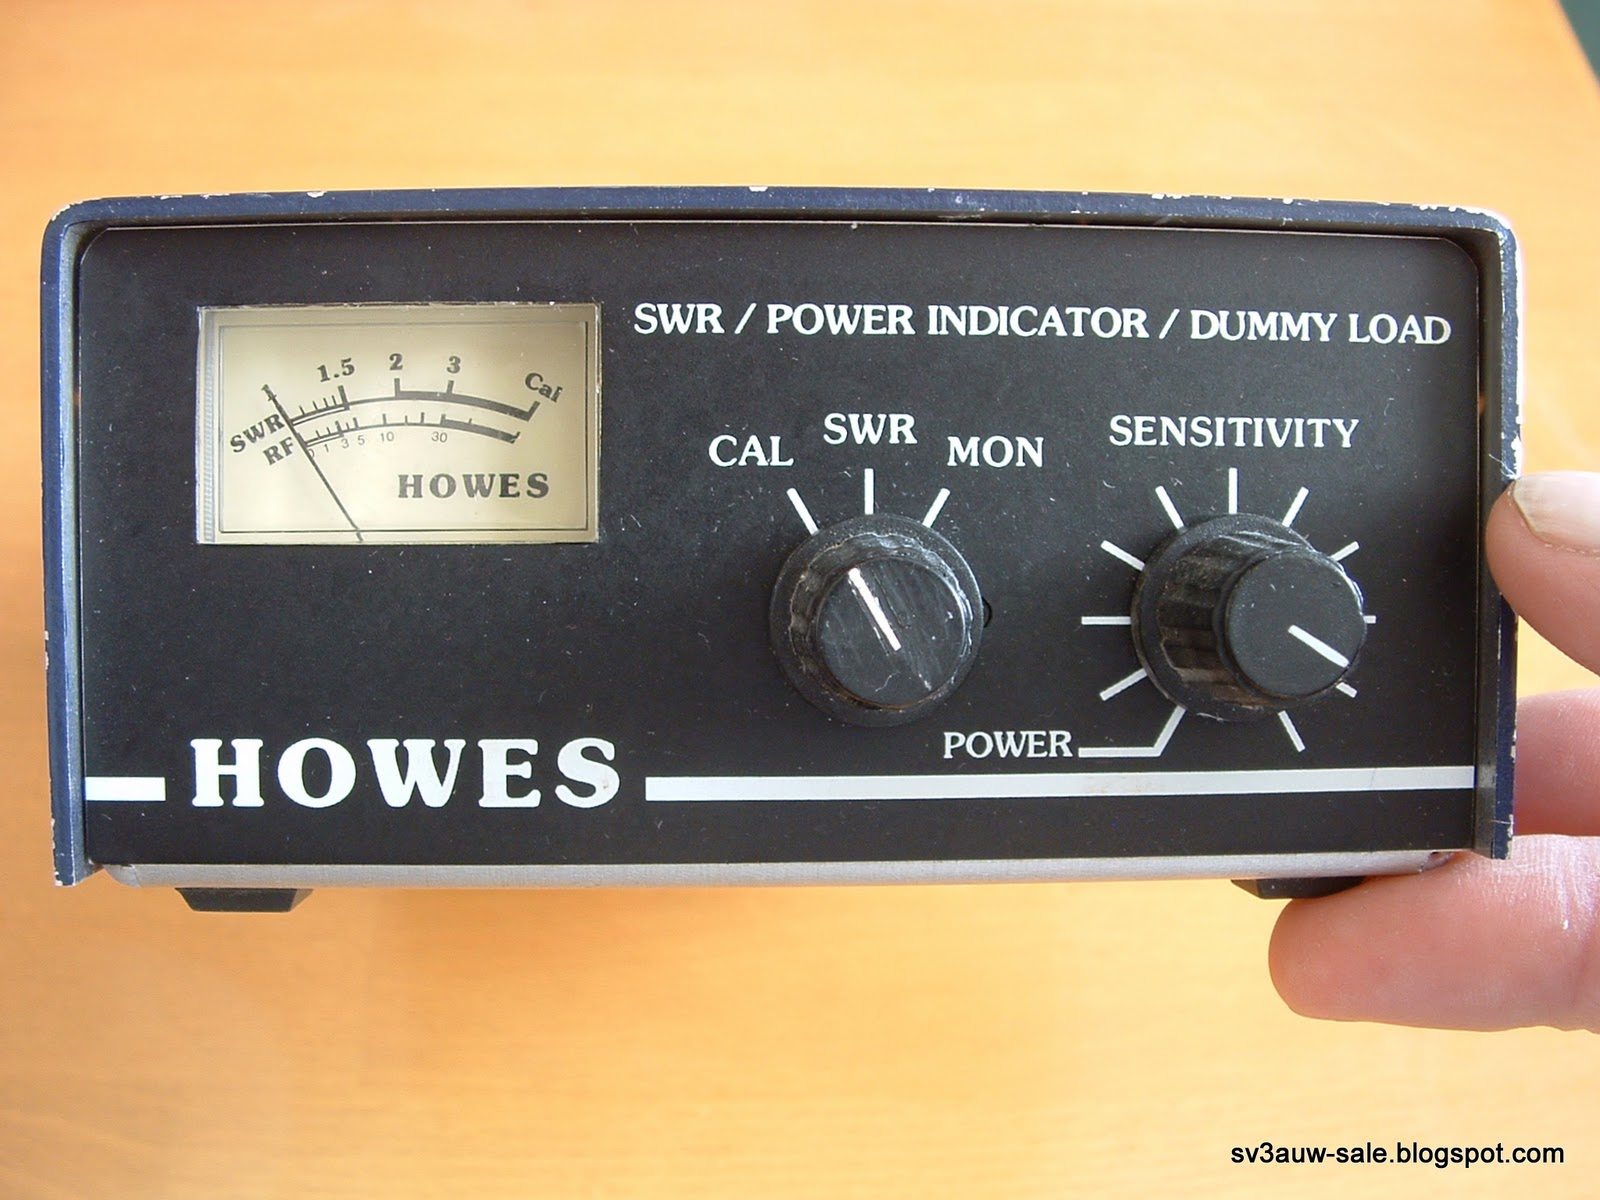 Load Indicator Rated Capacity Indicator : Sv auw sale howes kits swr power indicator dummy load sw b